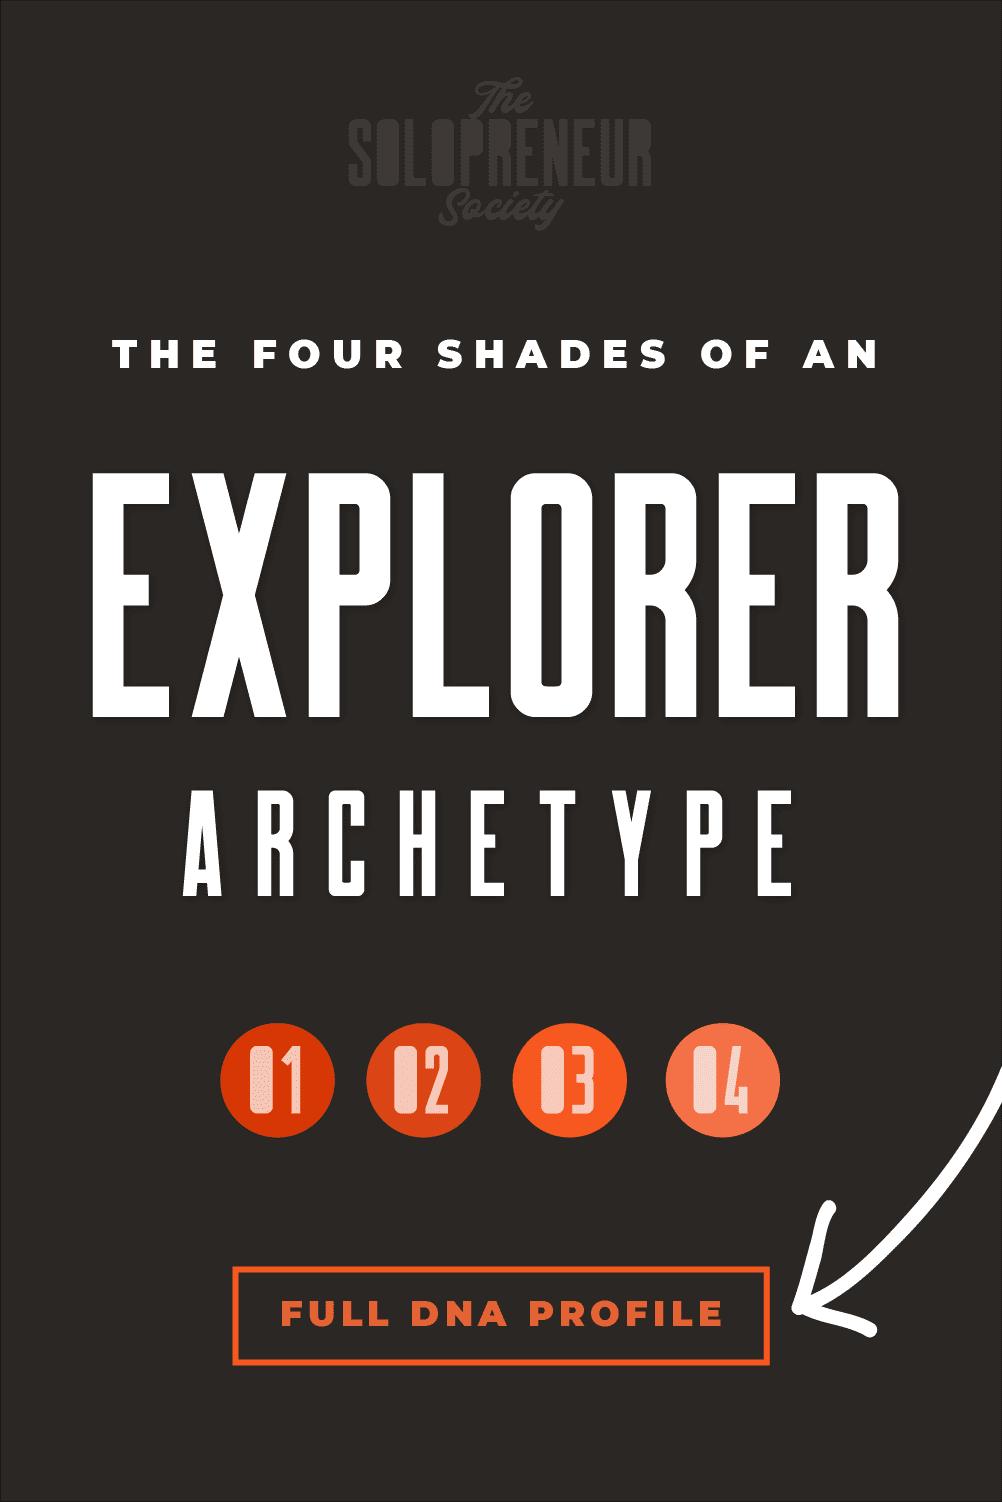 Explorer Archetype Brand Personality